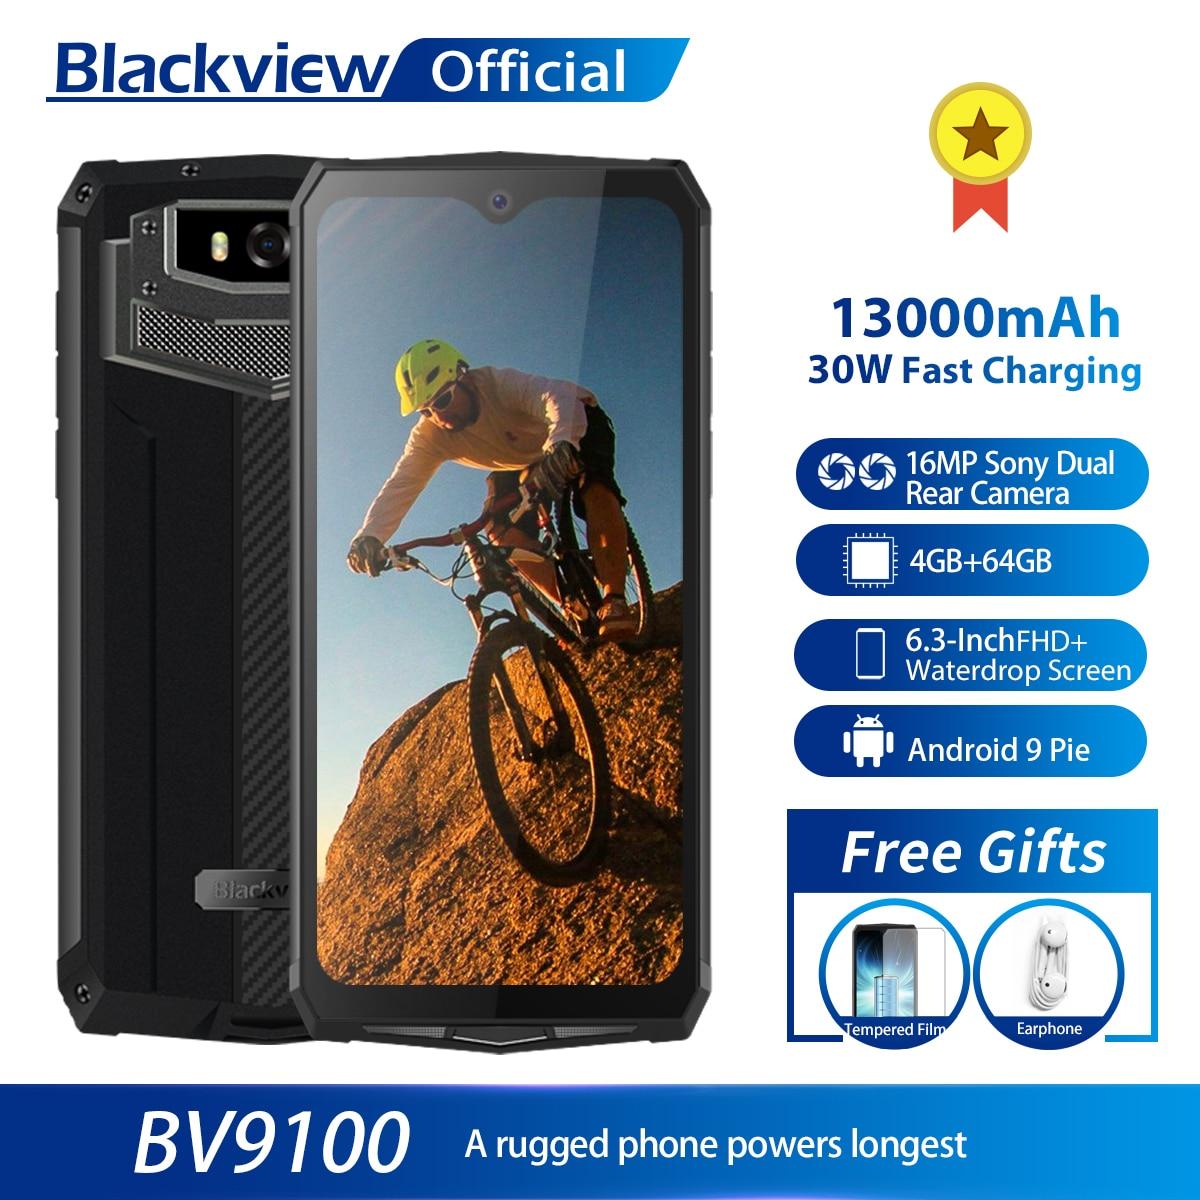 Смартфон Blackview BV9100, 13000 мАч, водонепроницаемый, прочный, Helio P35, 4 Гб + 64 ГБ, Android 9,0, мобильный телефон, быстрая зарядка 30 Вт